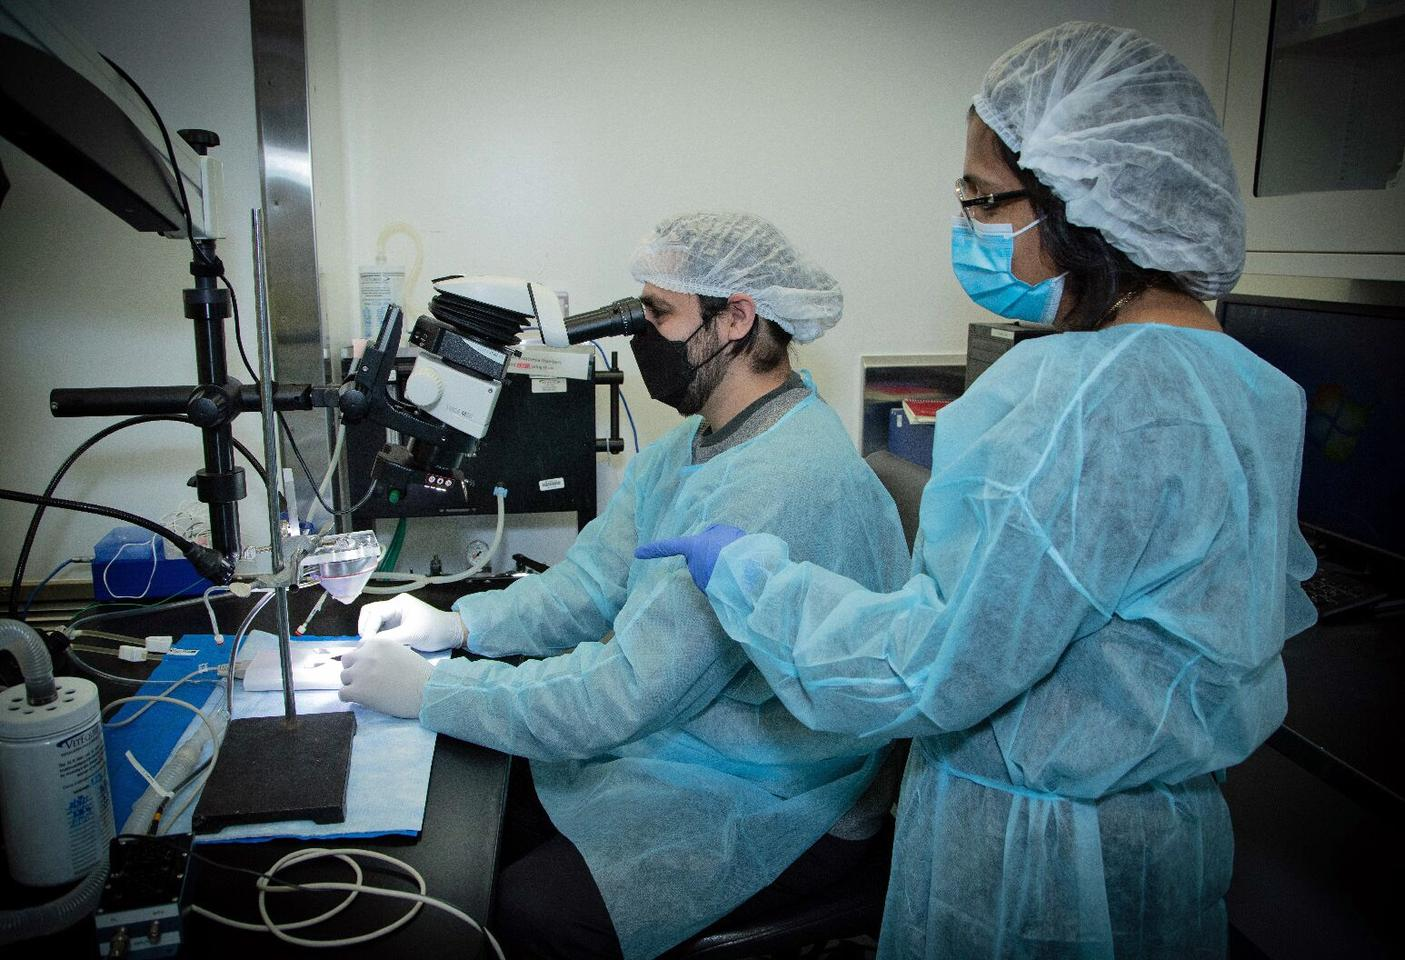 Tomas Huerta (left) and Sangeeta Chavan (right), researchers on the new study